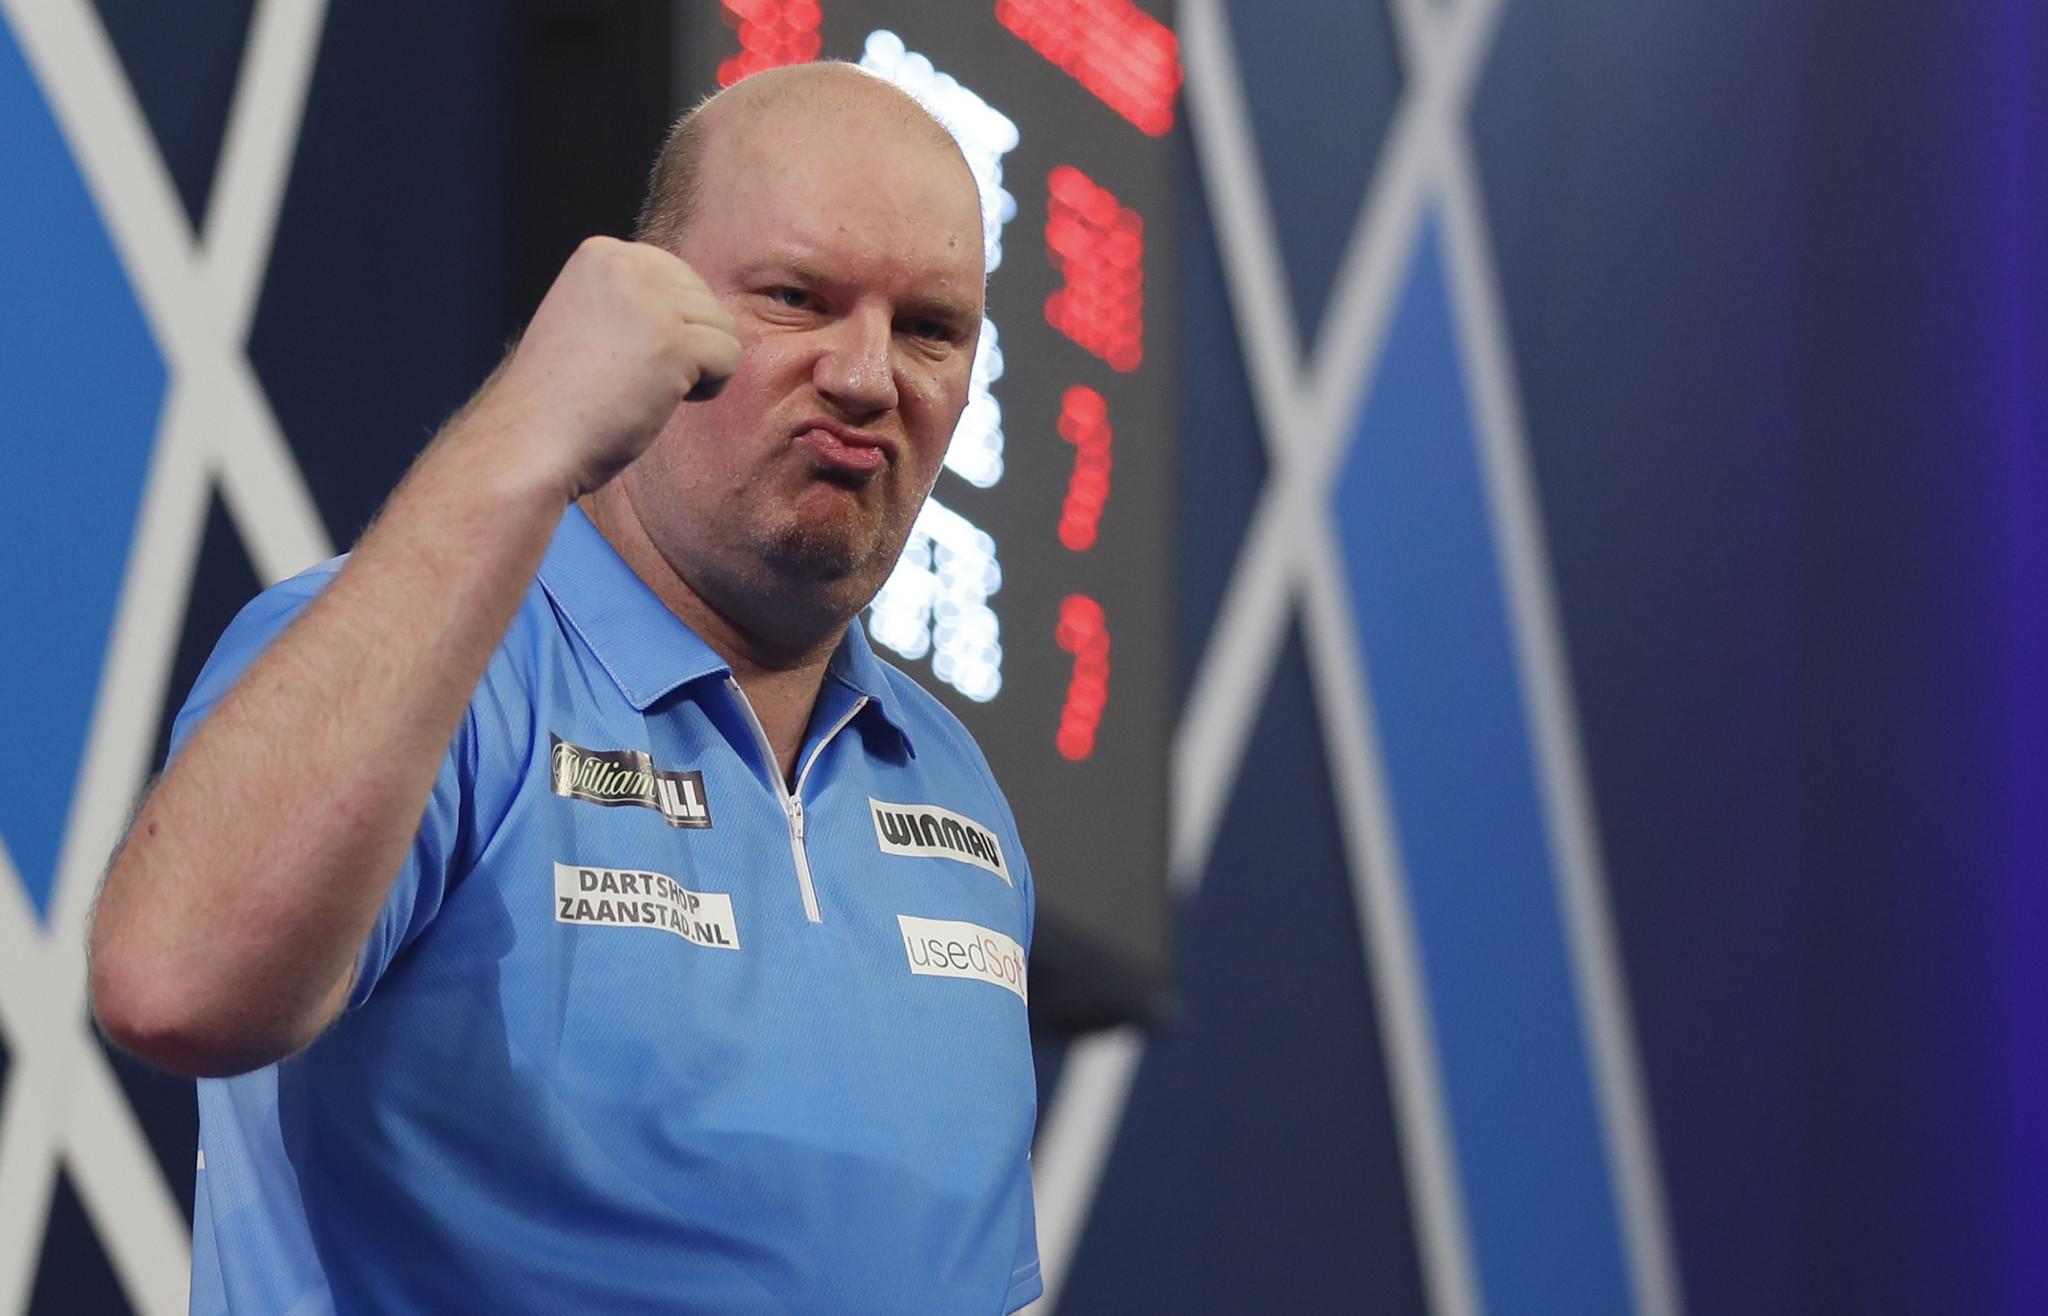 Van Der Voort produces great escape as Carolissen receives bye at PDC World Darts Championship